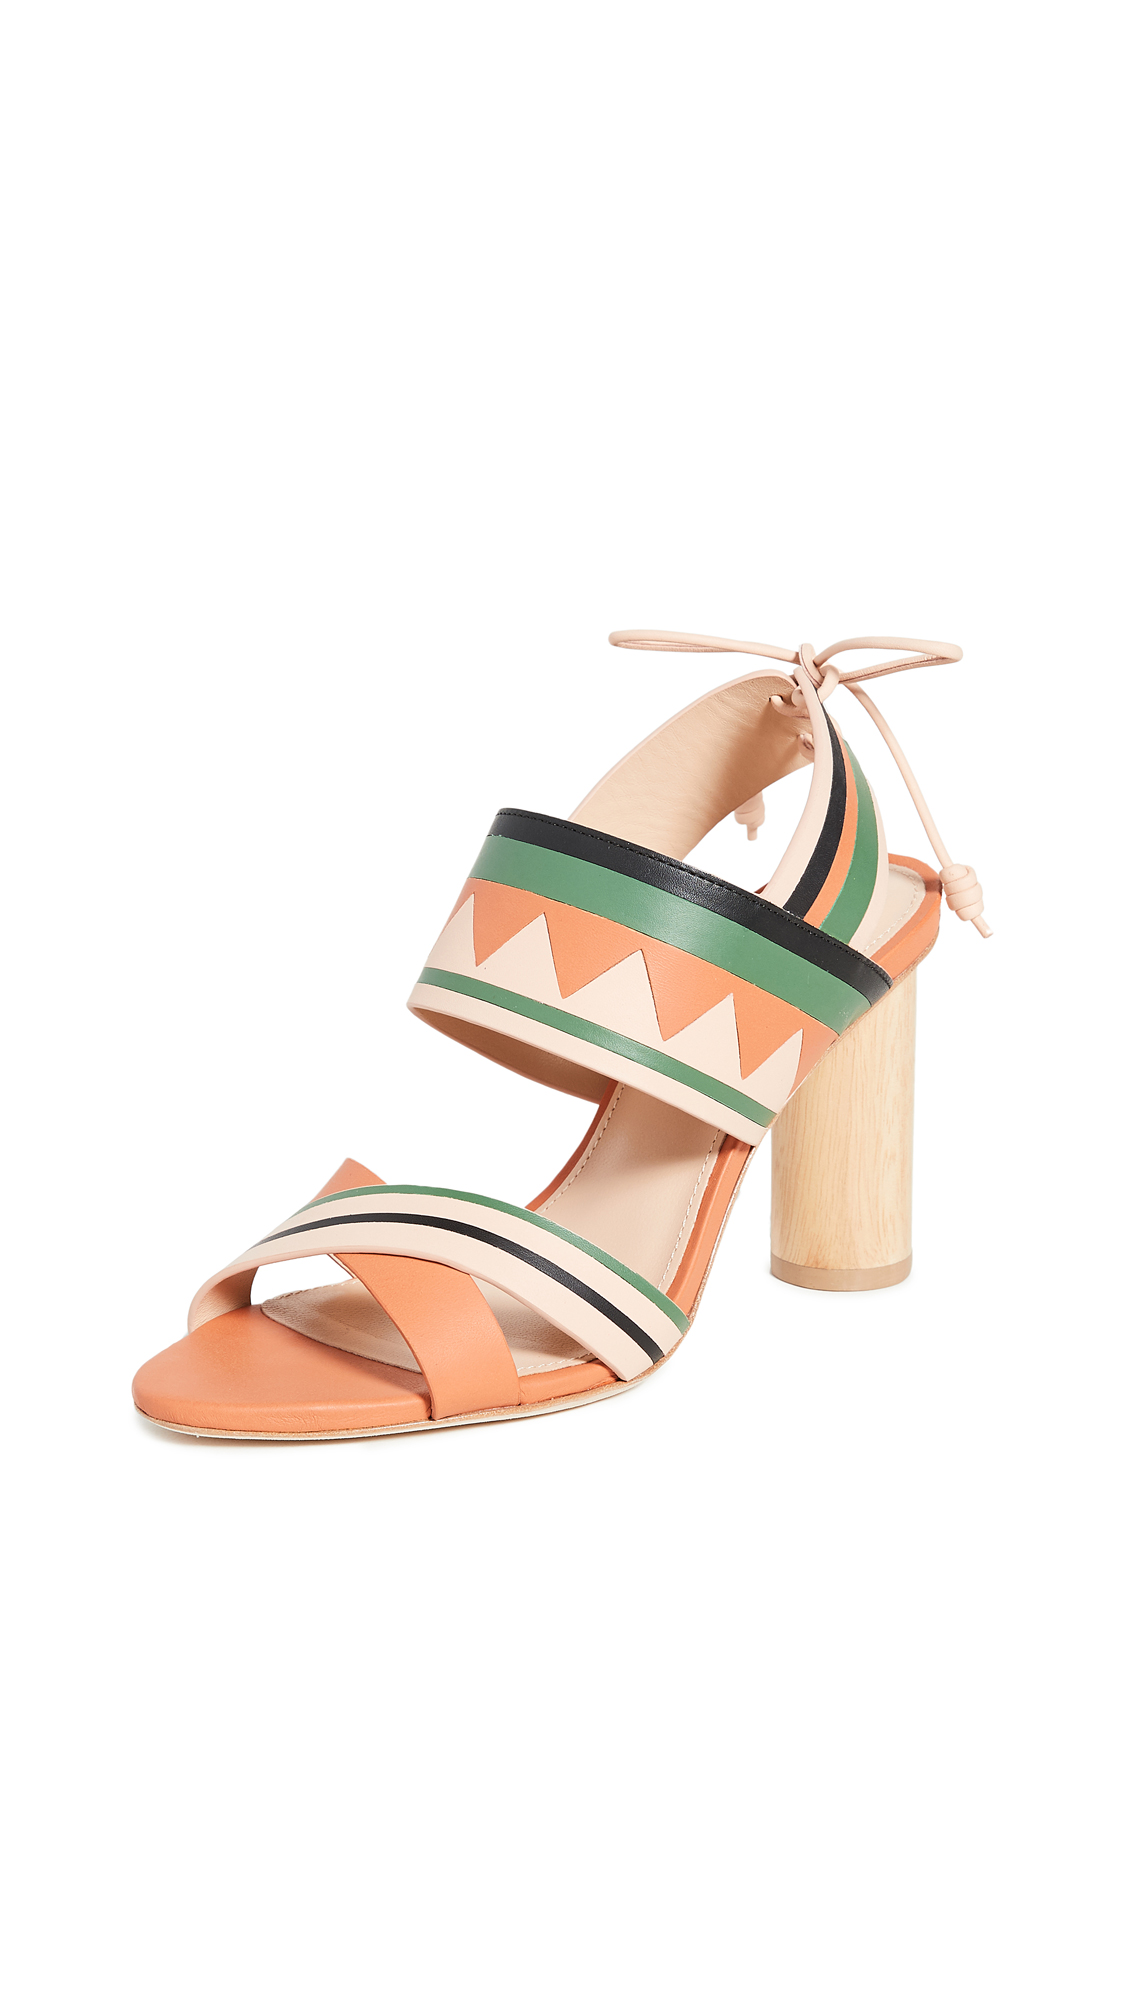 Buy Ulla Johnson Milou Heel Sandals online, shop Ulla Johnson